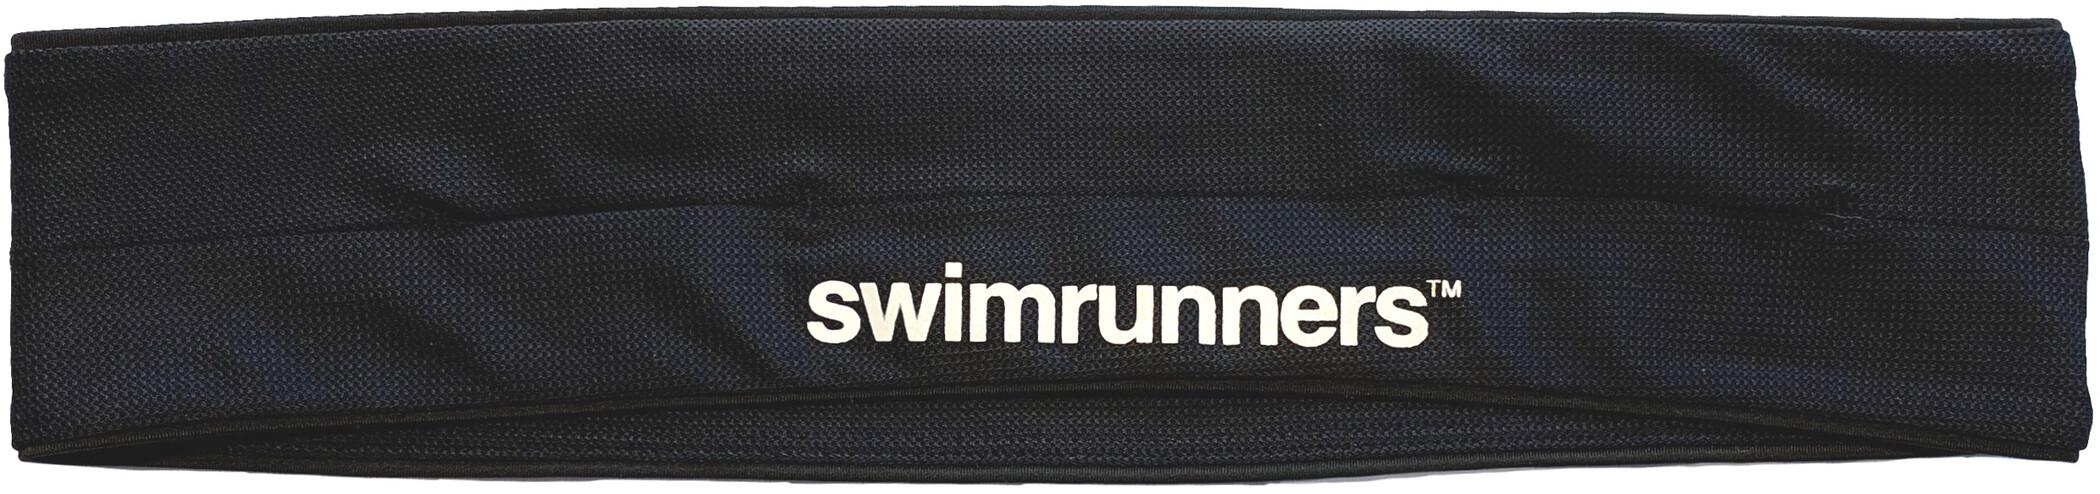 Swimrunners Kangaroo 360° Bælte, black (2019)   misc_clothes